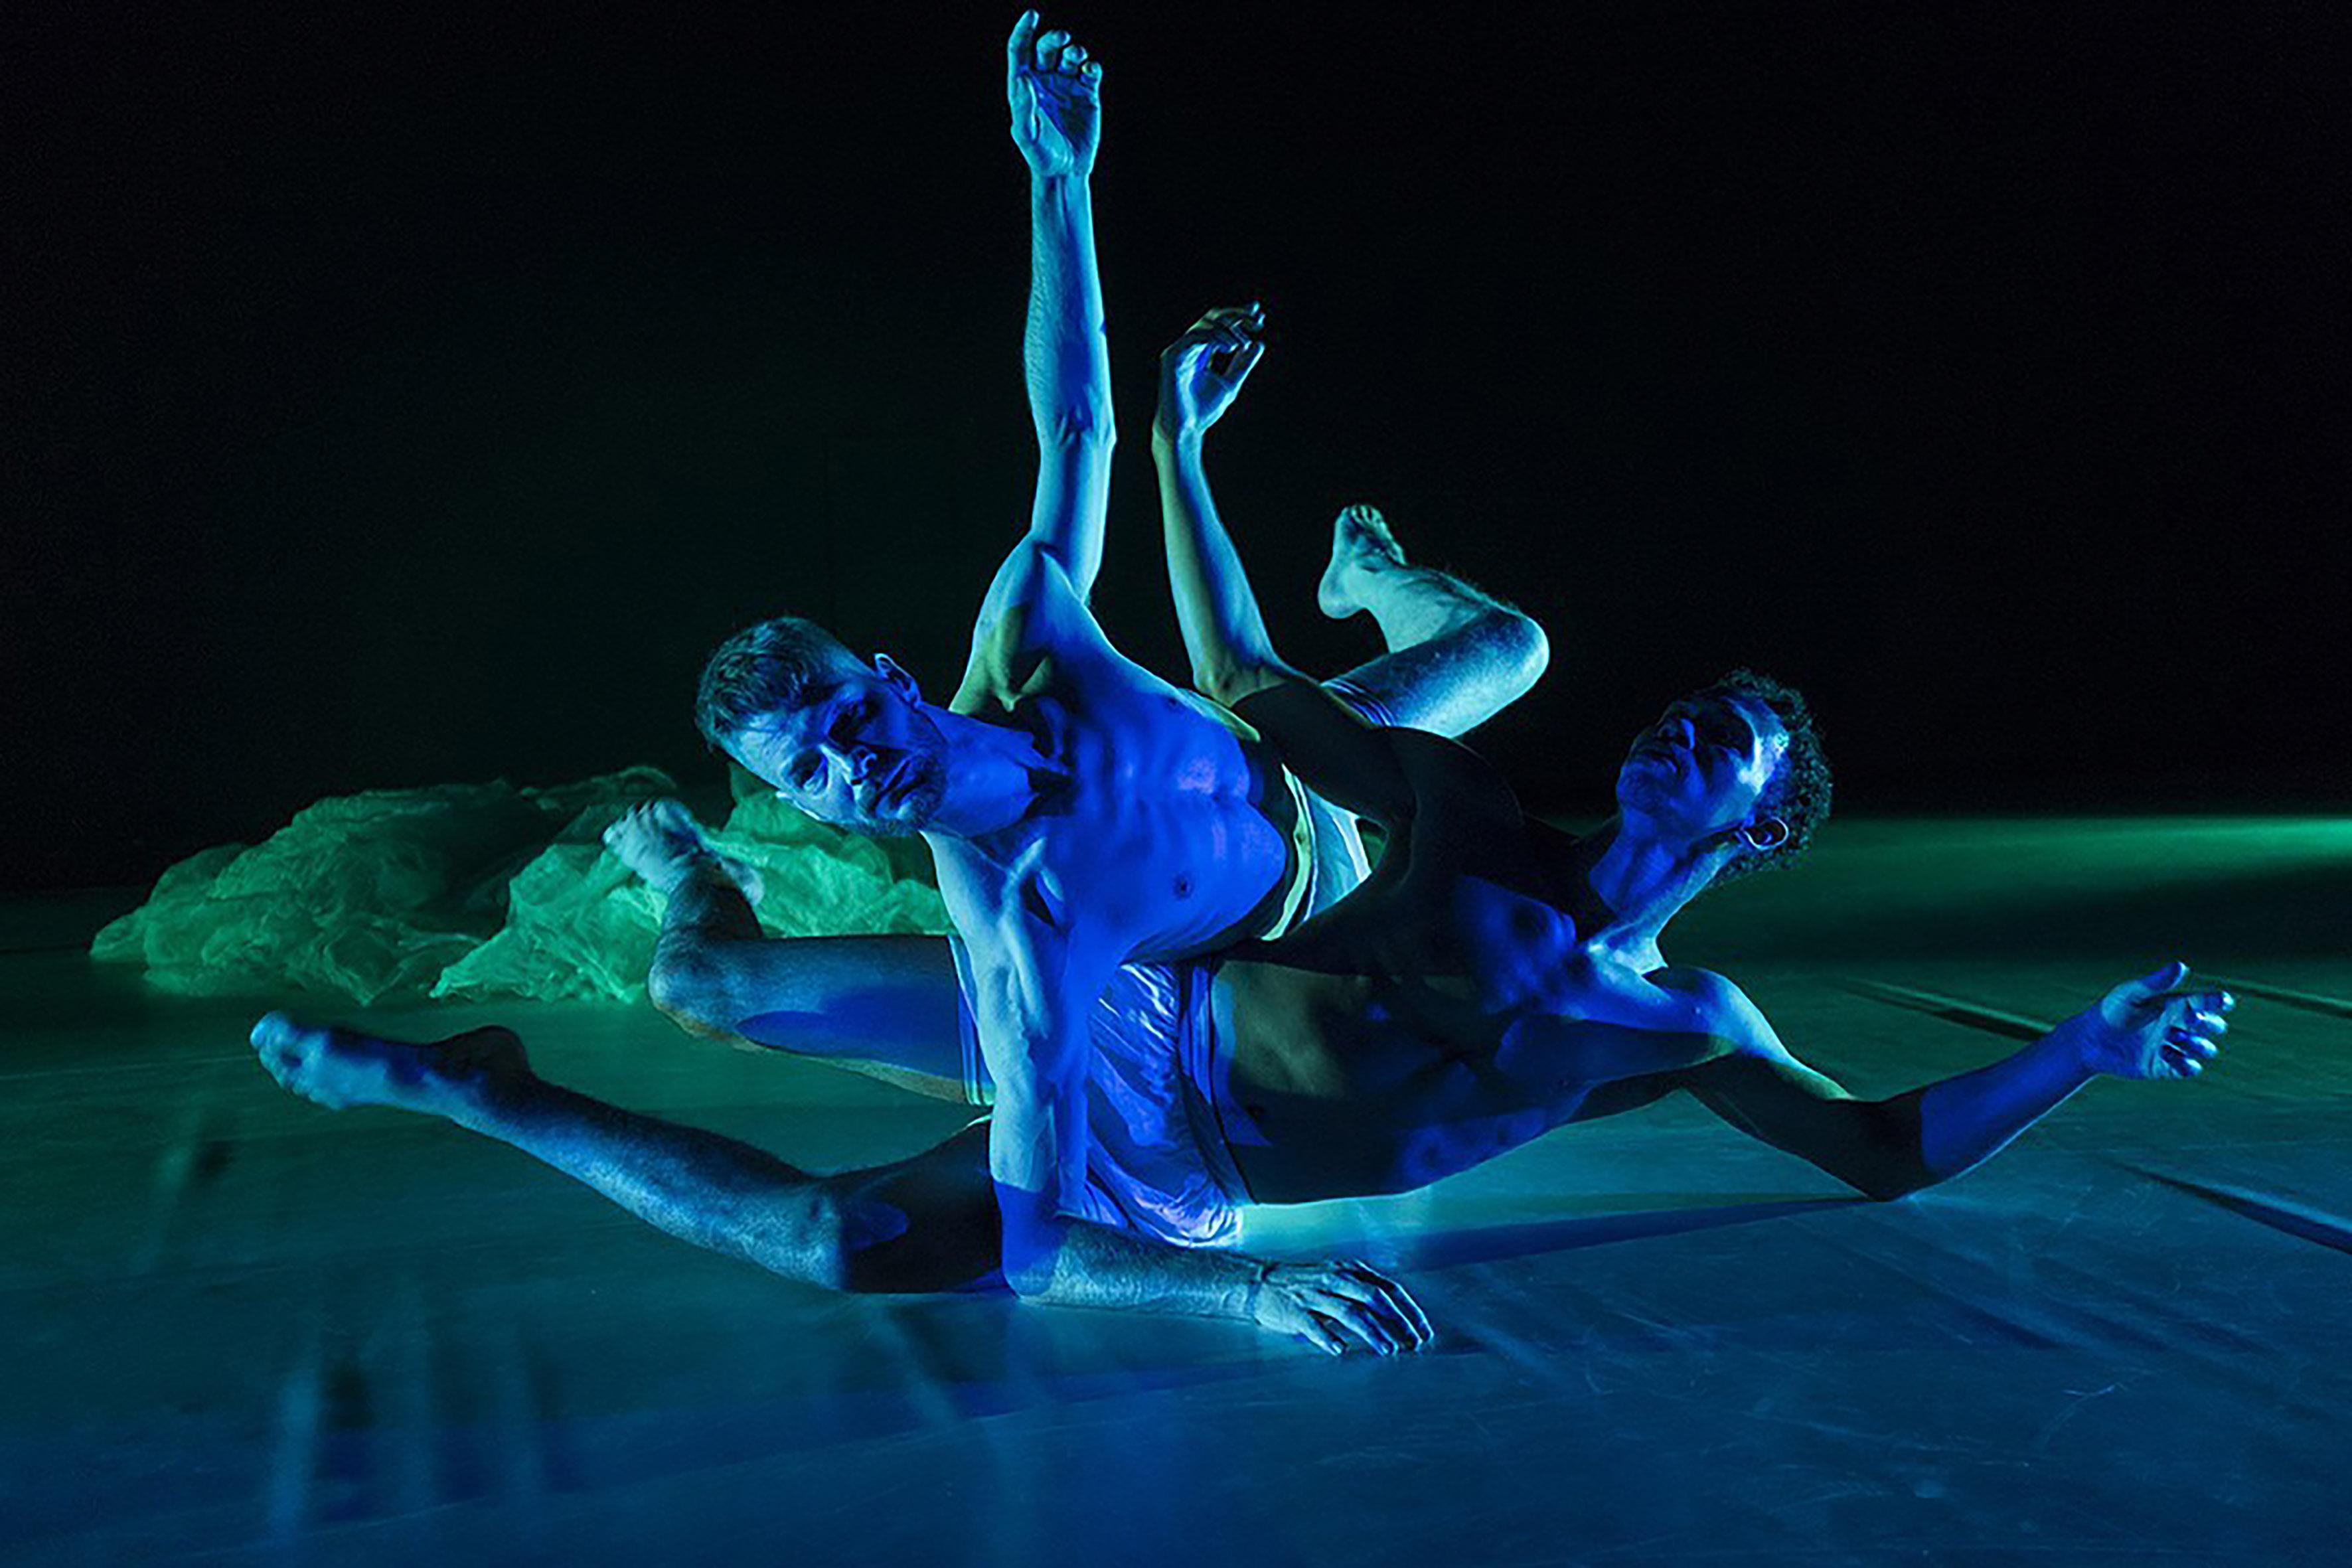 Yggdrasil Dance, Climate trilogy, Siku Aappoq & Isen Smelter. Foto: Björn Abelin © Björn Abelin